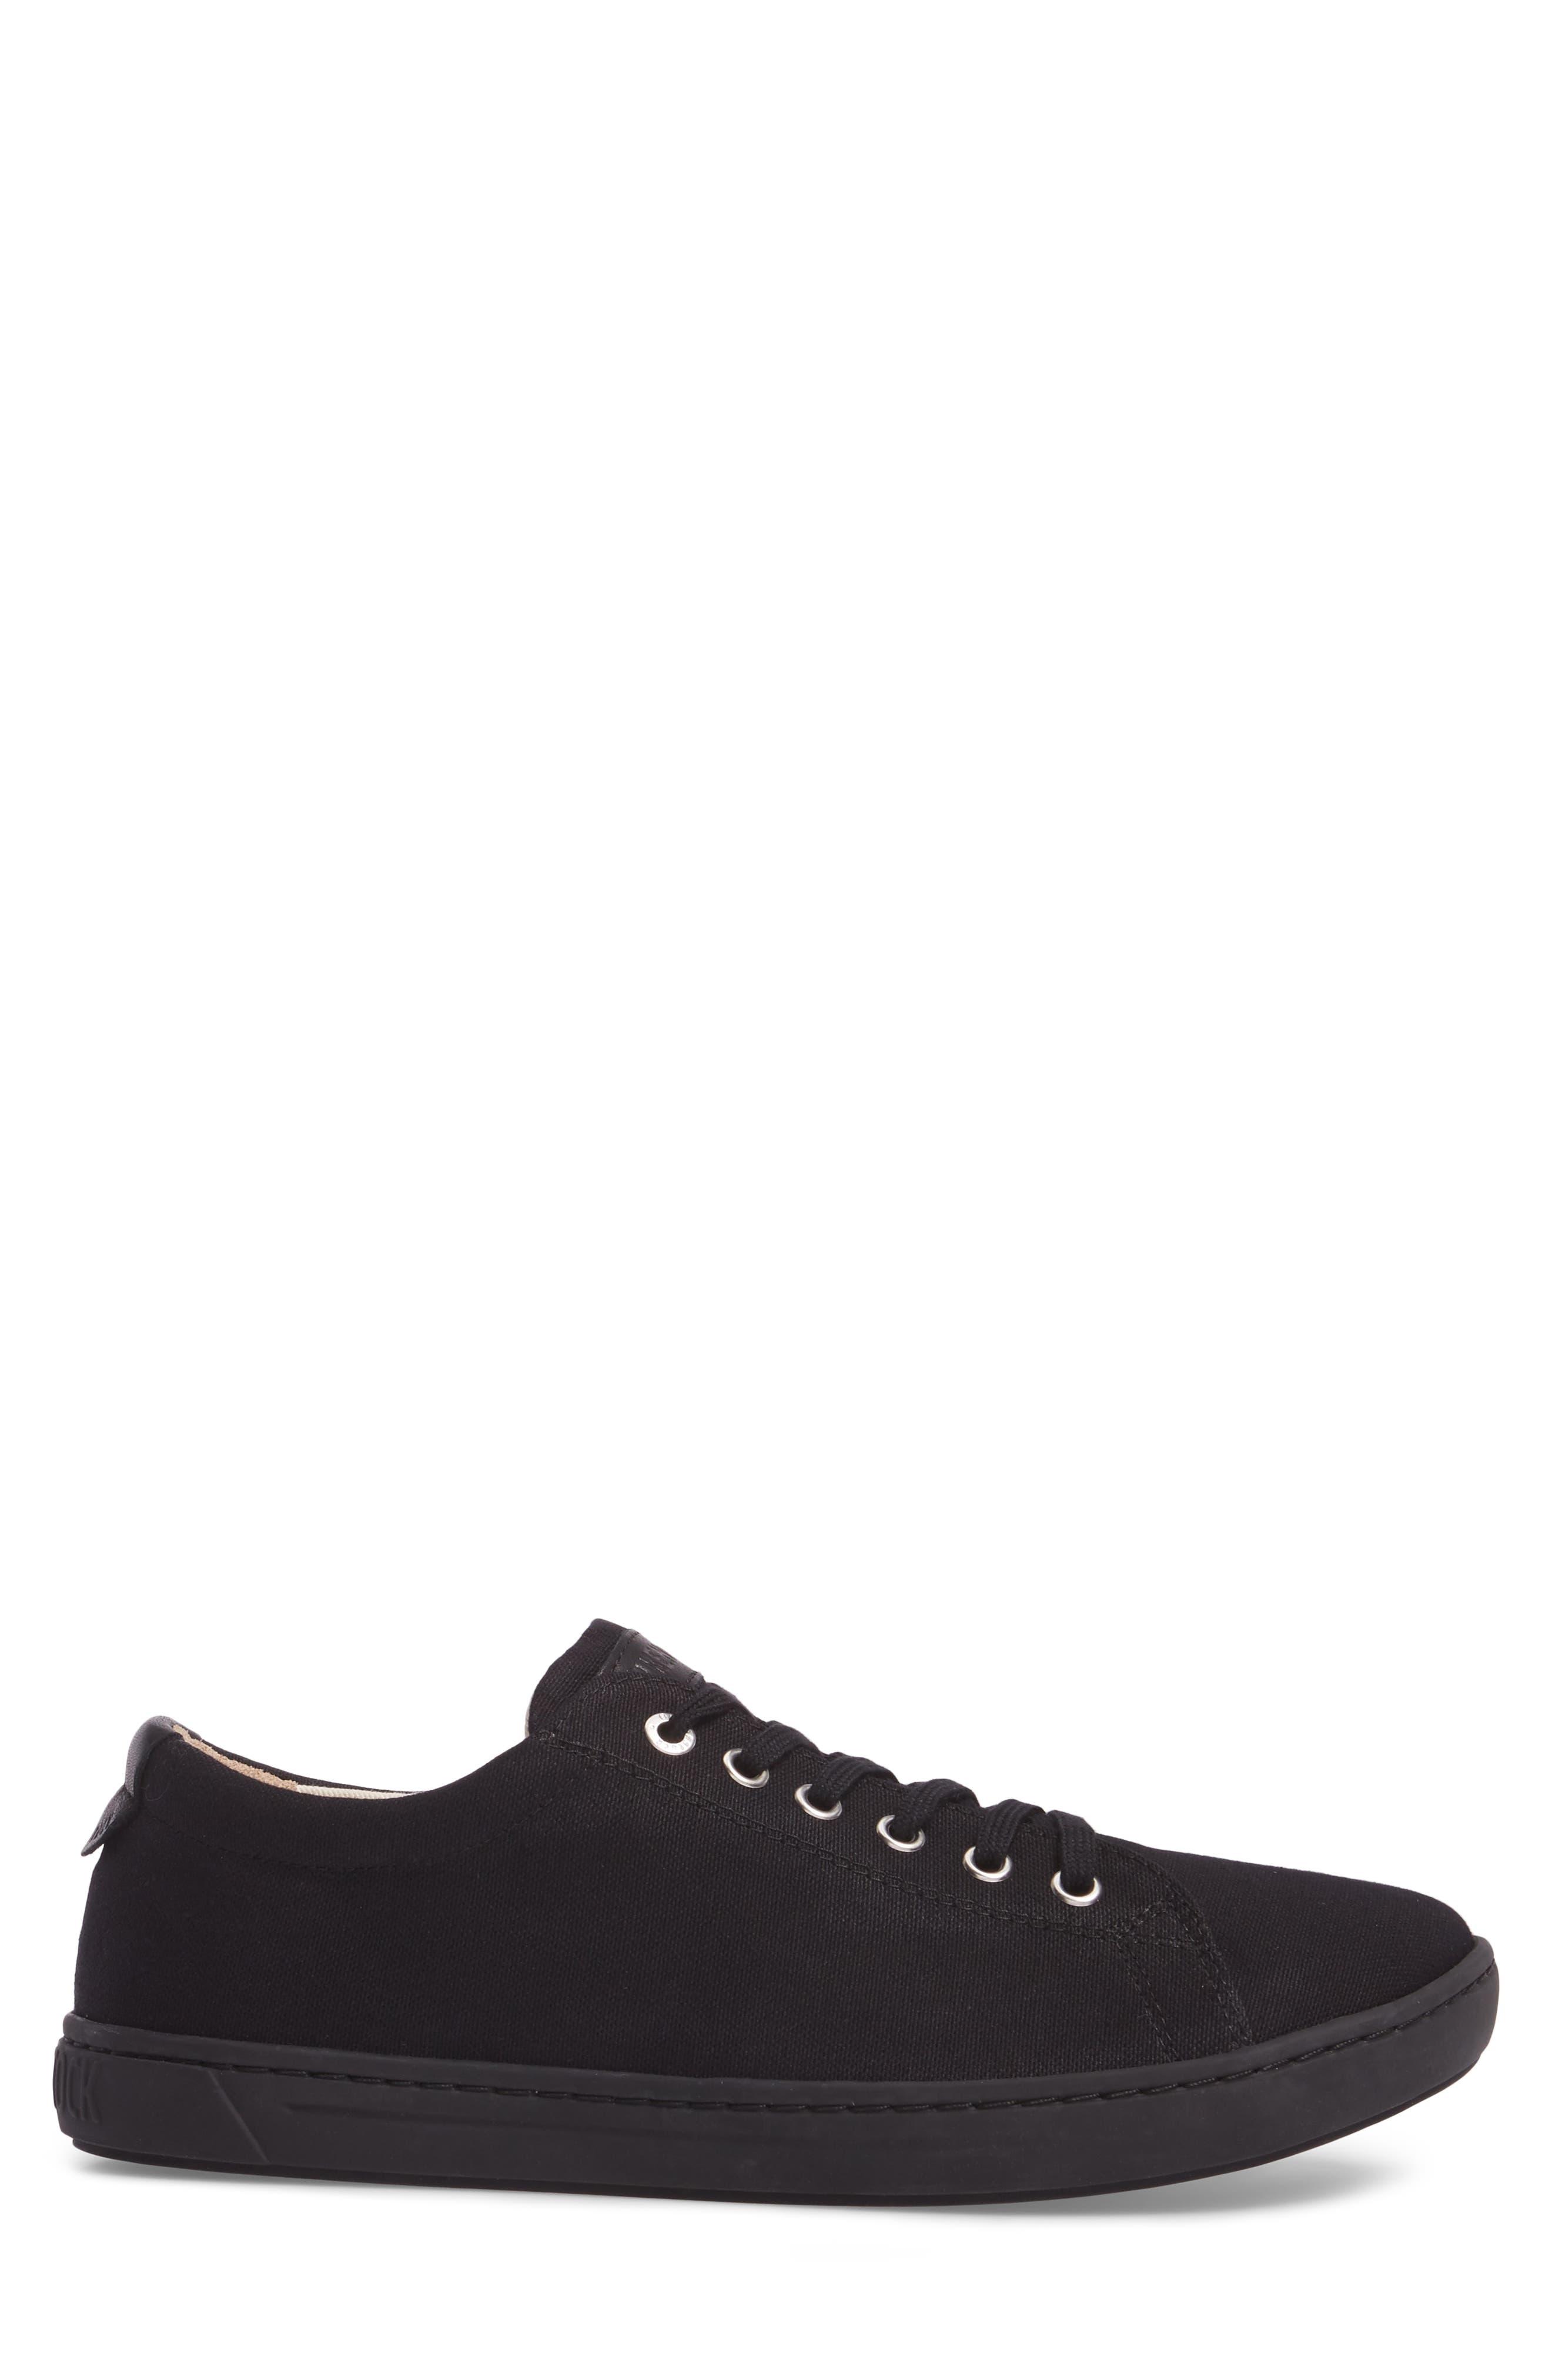 Arran Sneaker,                             Alternate thumbnail 3, color,                             001